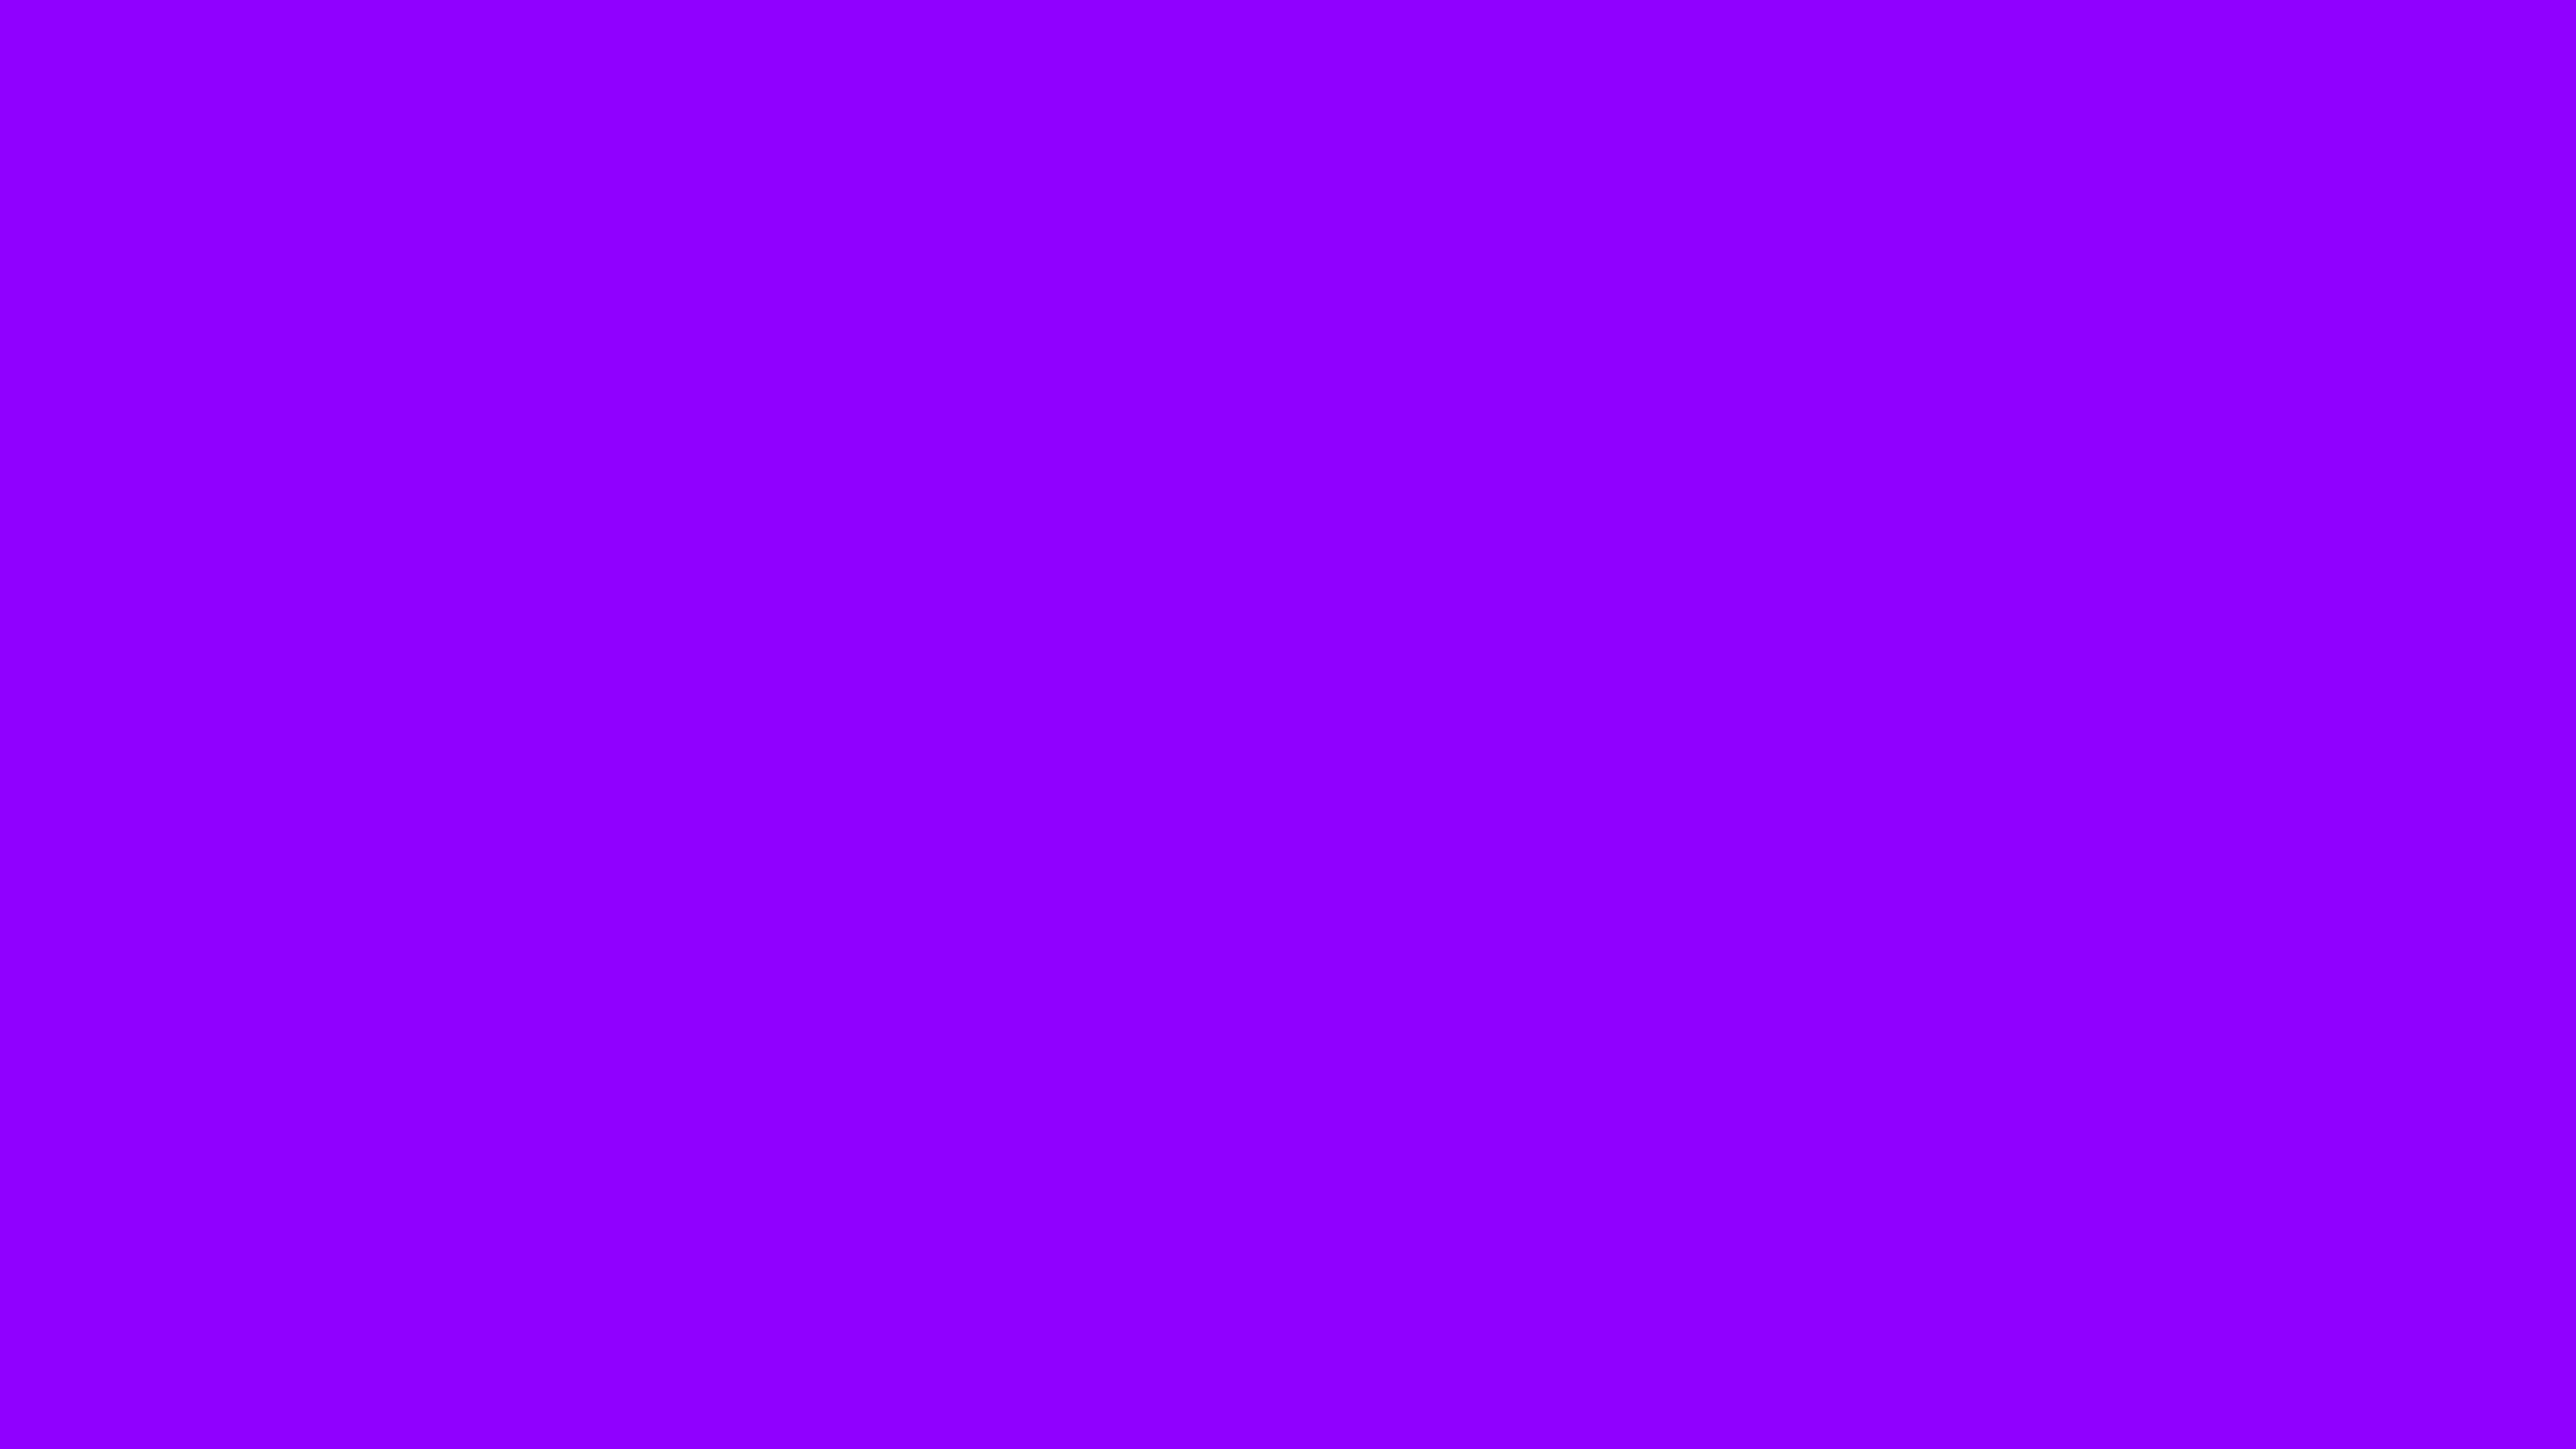 3840x2160 Electric Violet Solid Color Background